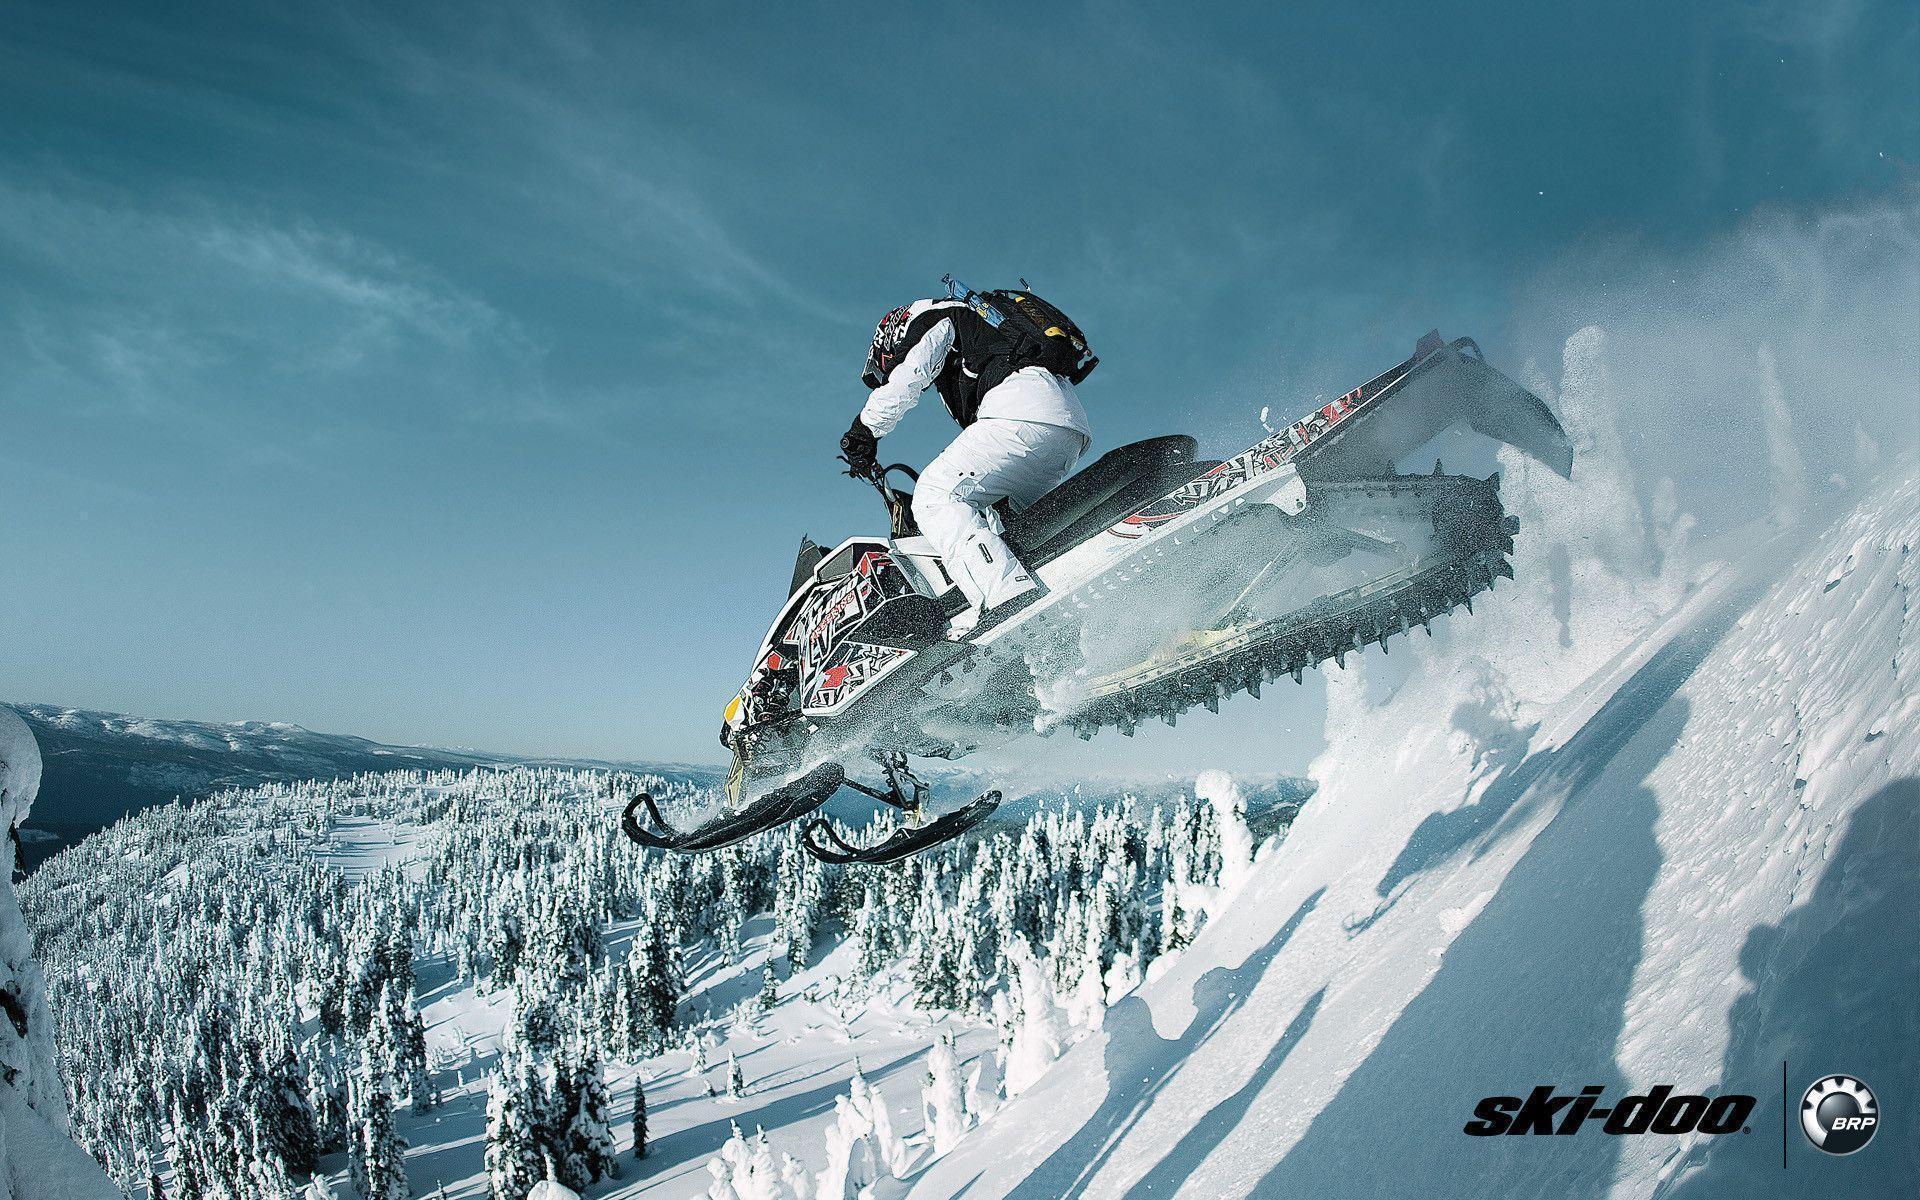 1920x1080 hd wallpapers snowmobile - photo #6